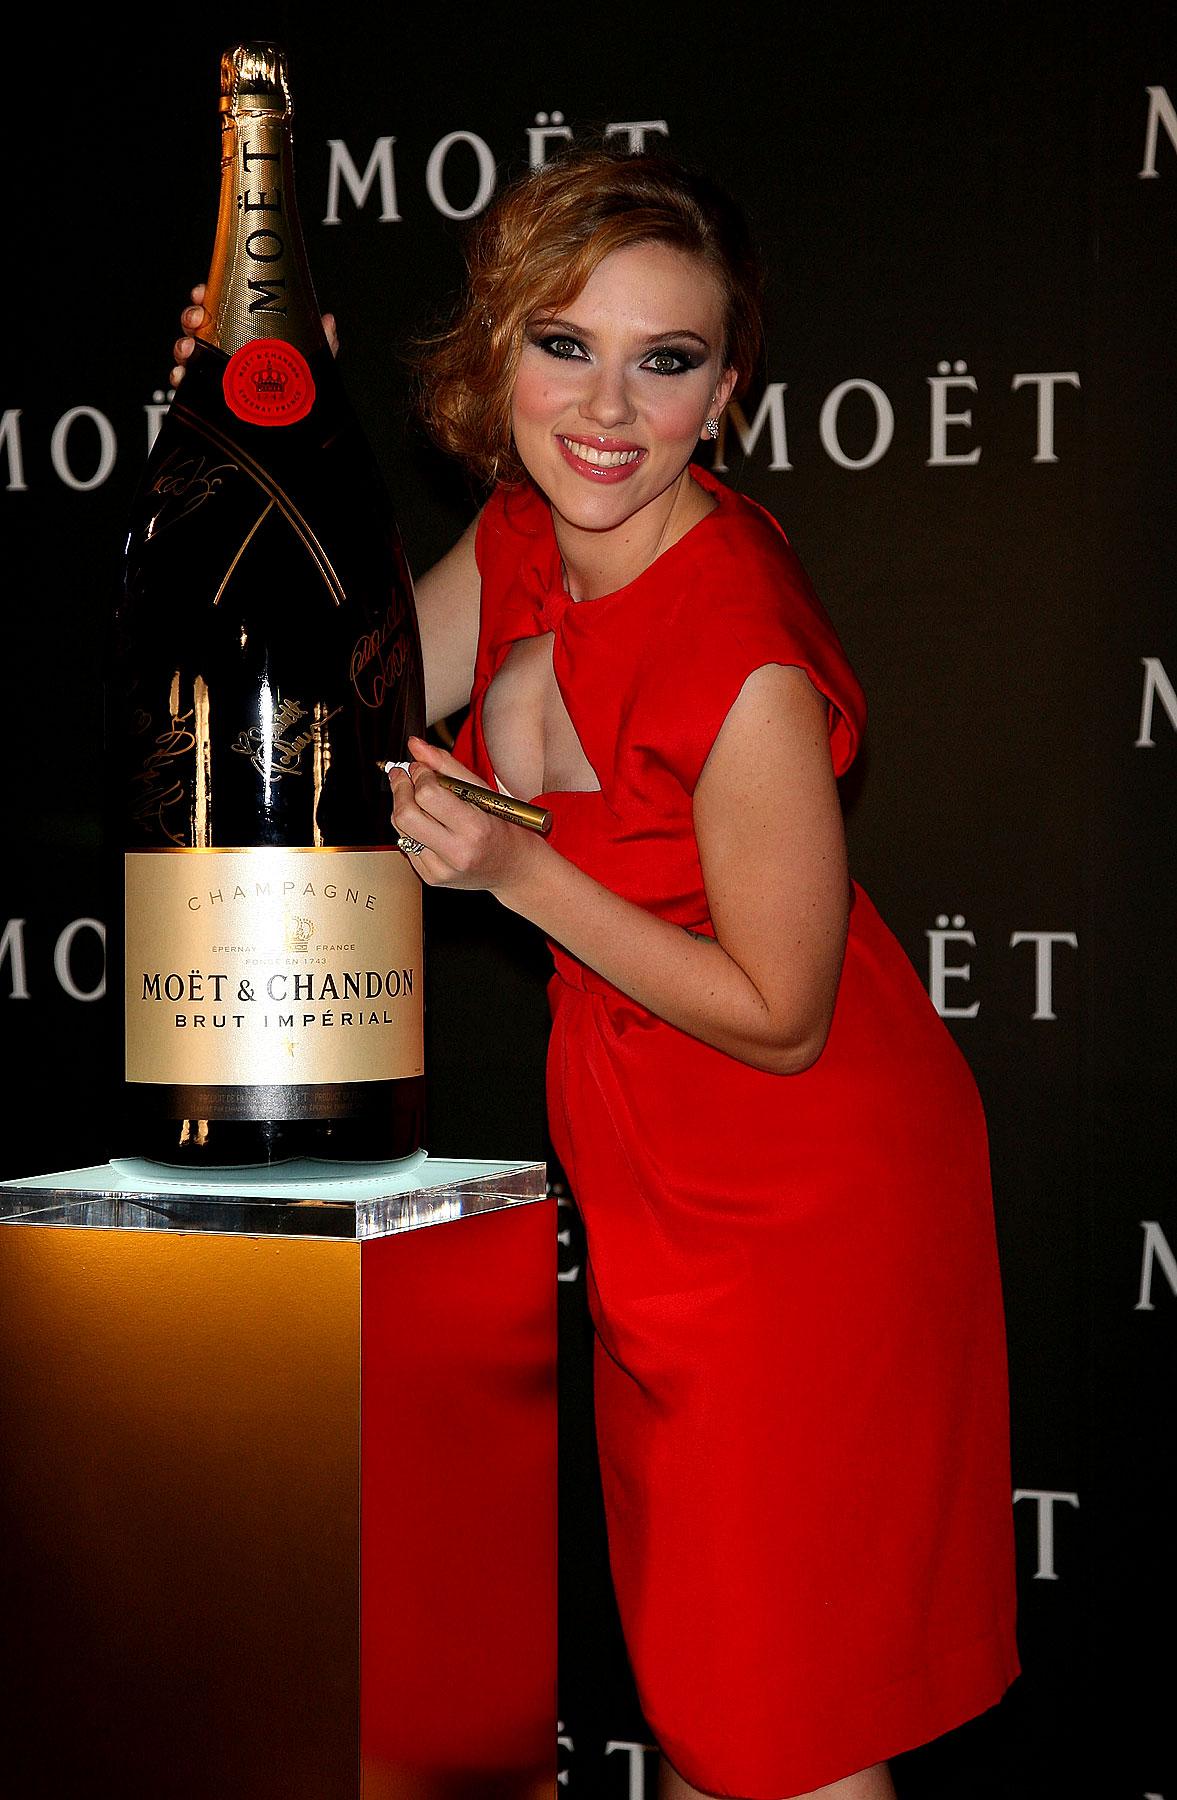 PHOTO GALLERY: Scarlett Johansson's Red Hot